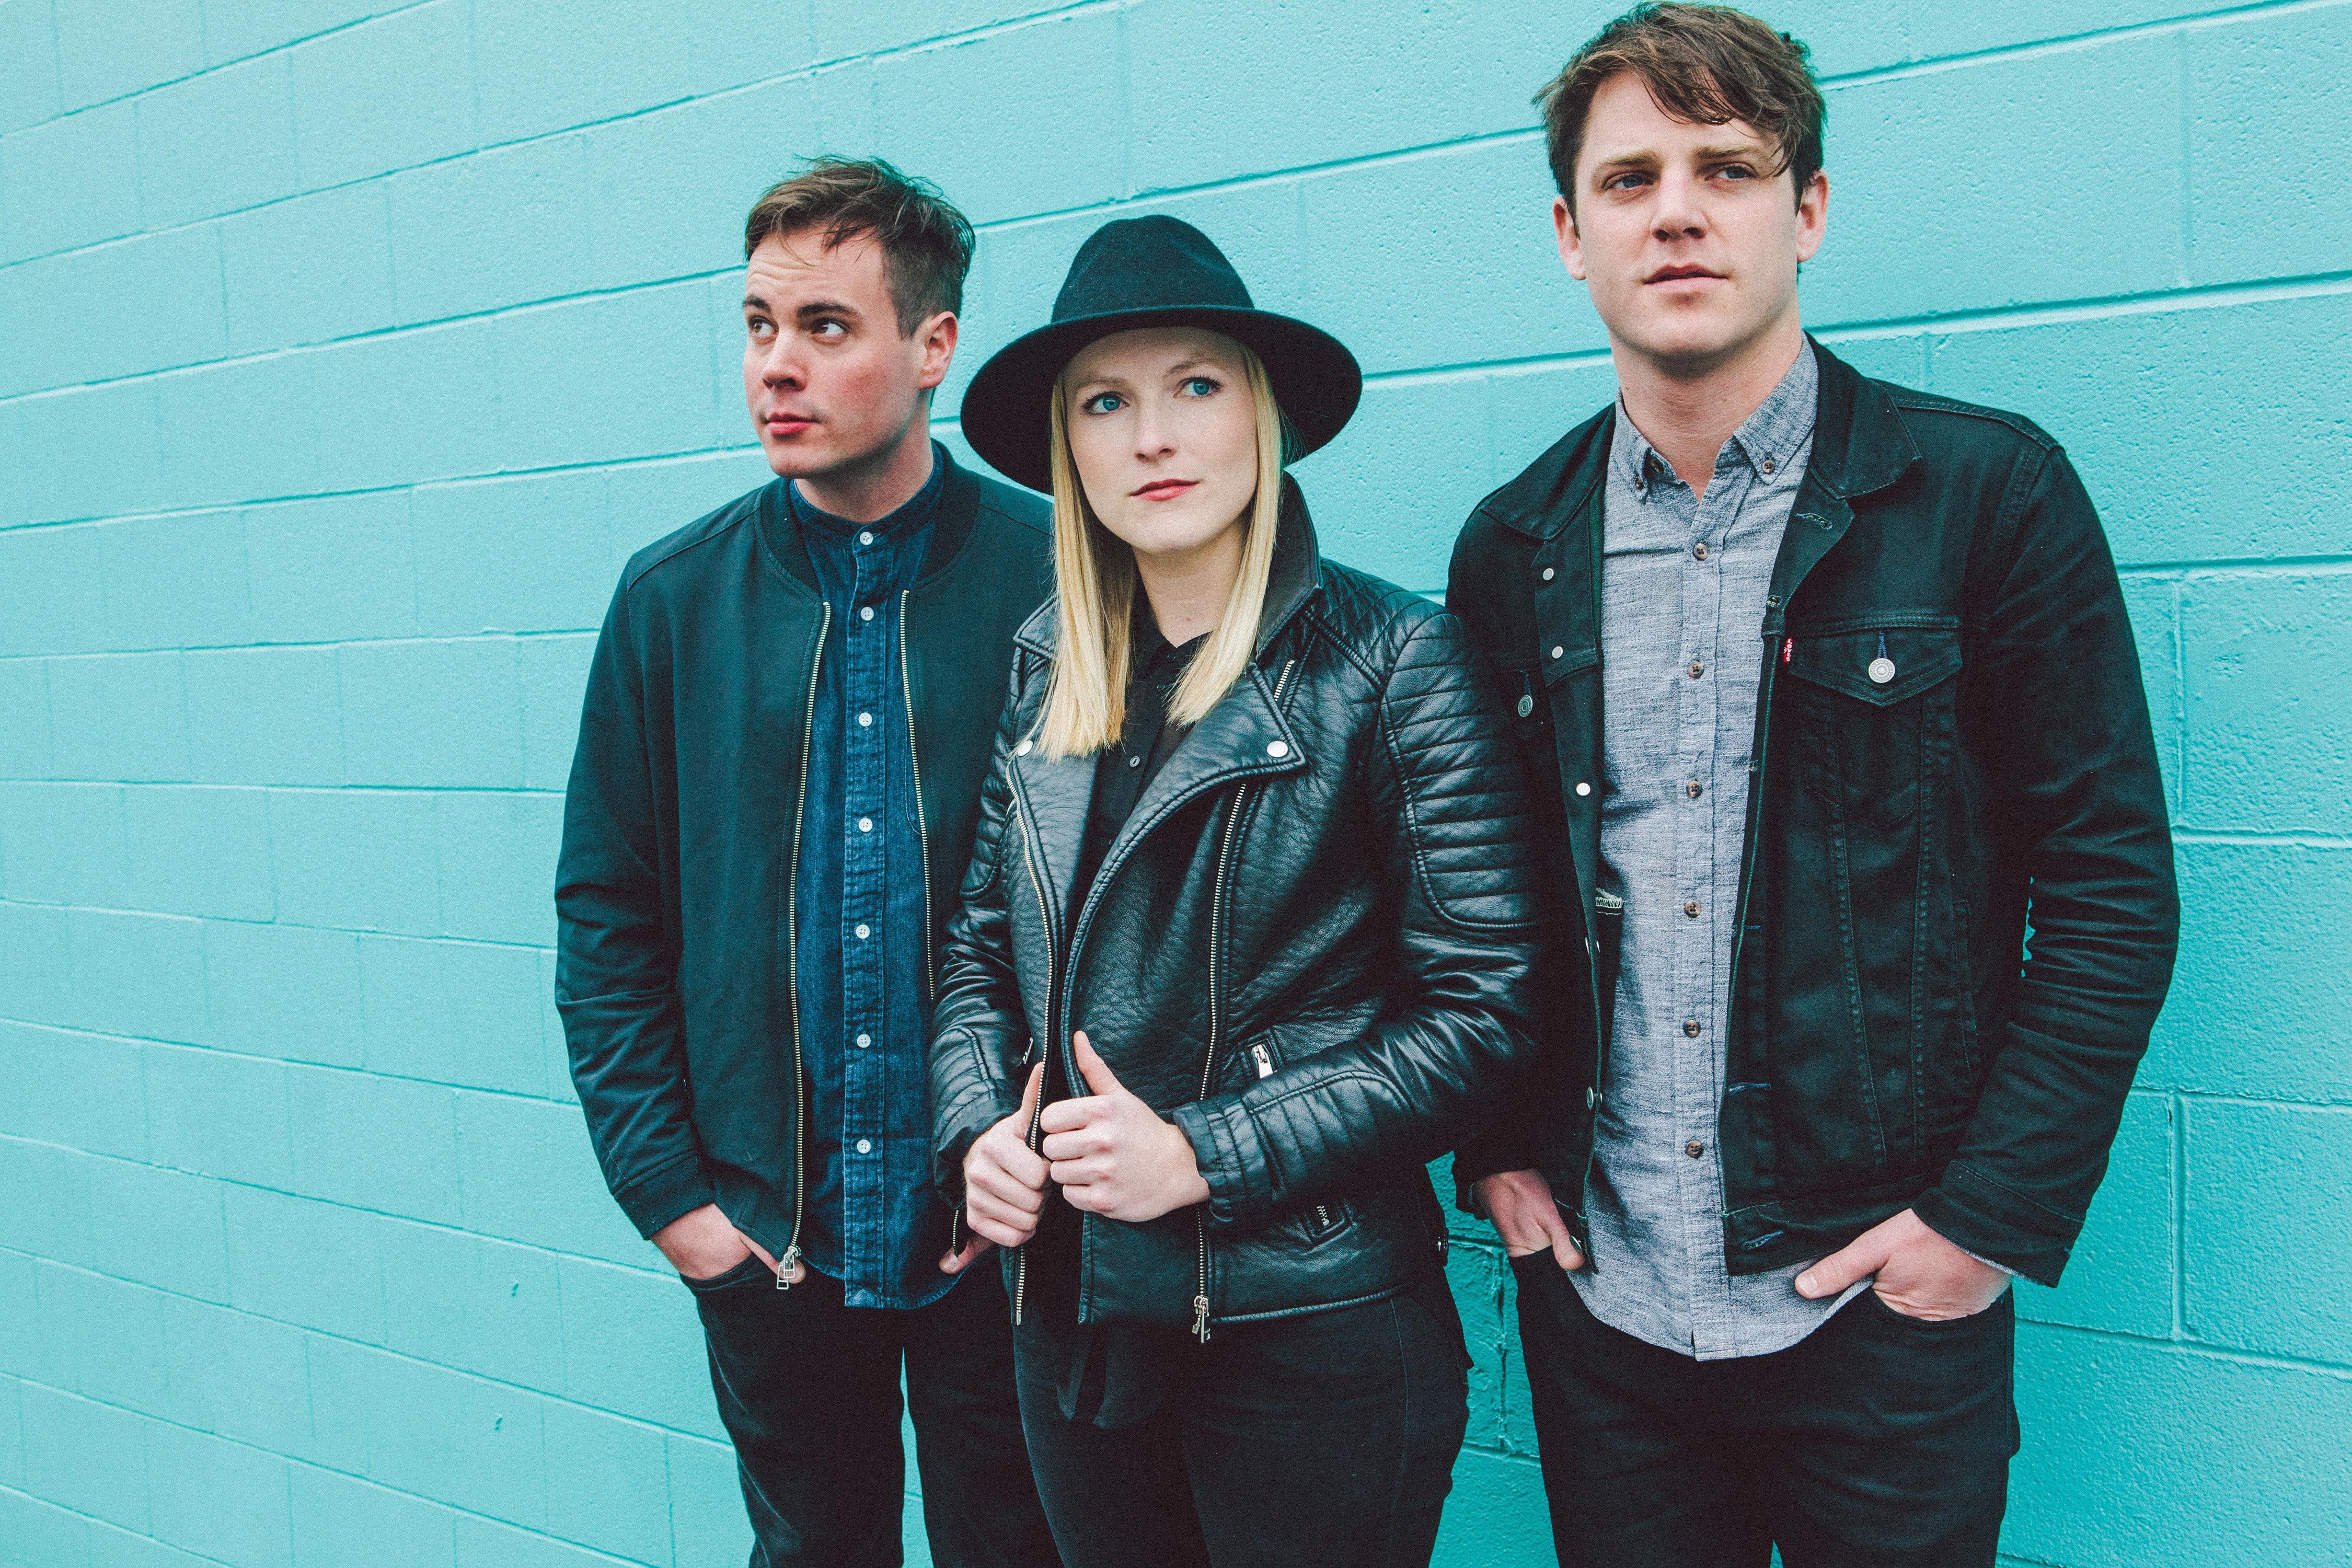 Port Cities Cast Off With New Album The Scene